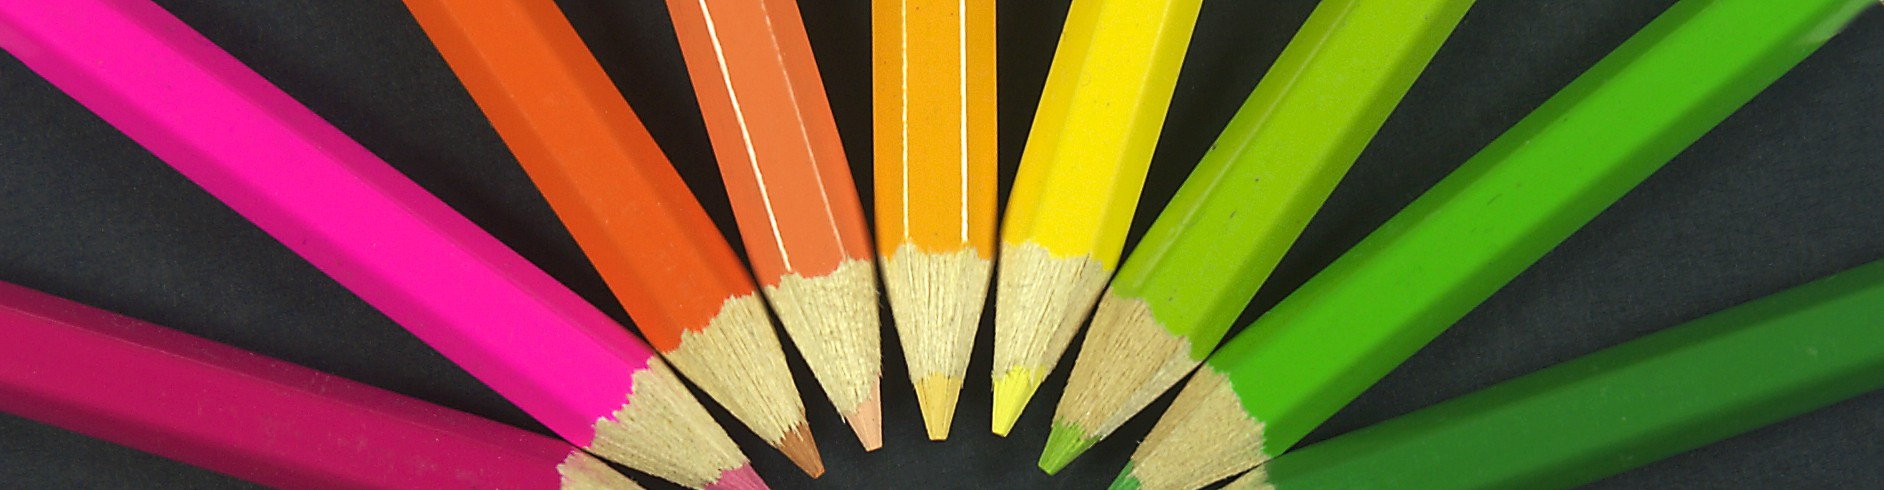 Bleistifte bedruckt – Werbebleistifte – Bleistifte bedrucken